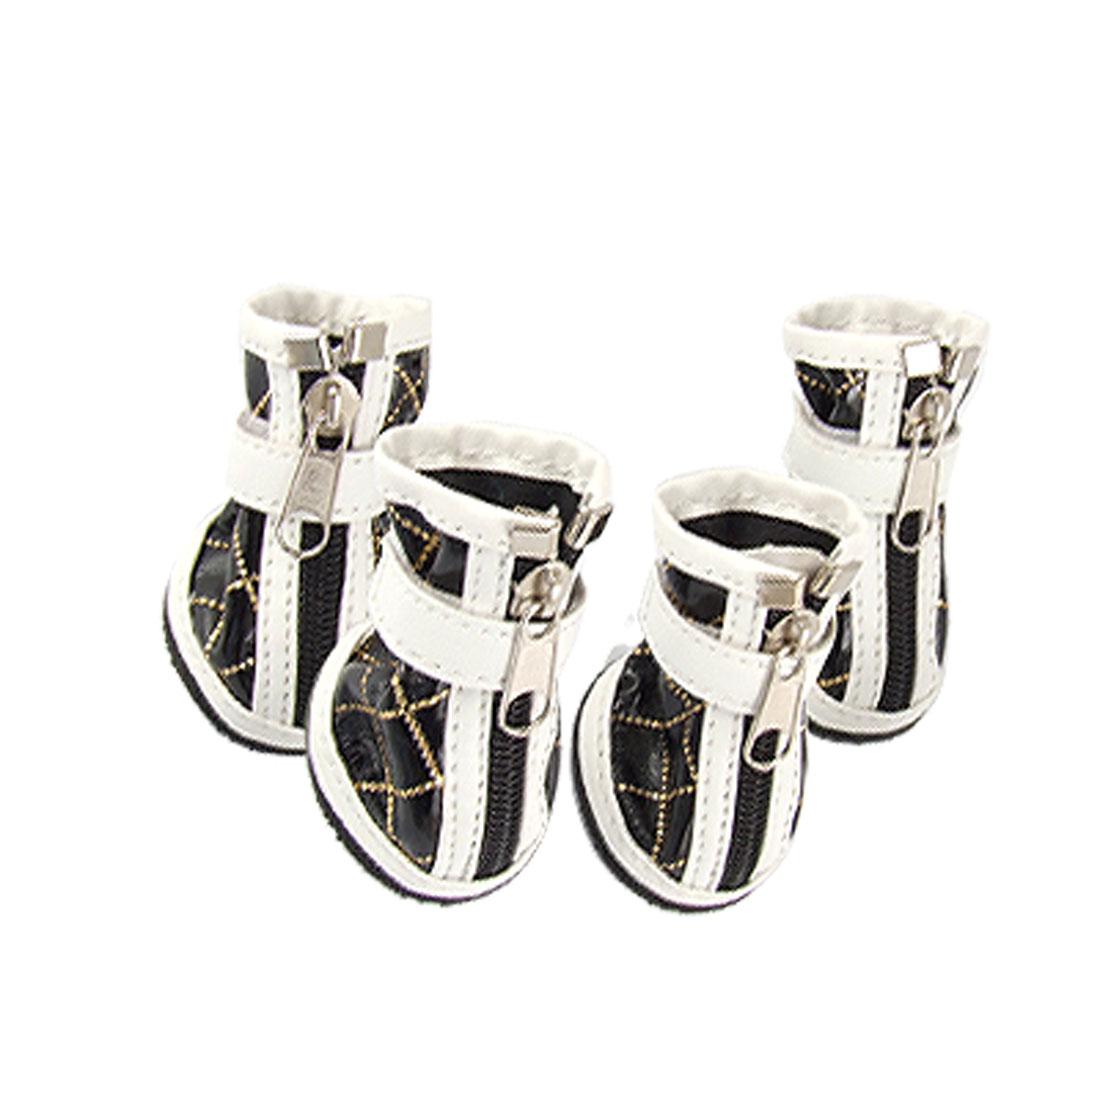 Size 4 Pet Dog Nonslip Rubber Sole Black White Faux Leather Zipped Boots 4 Pcs